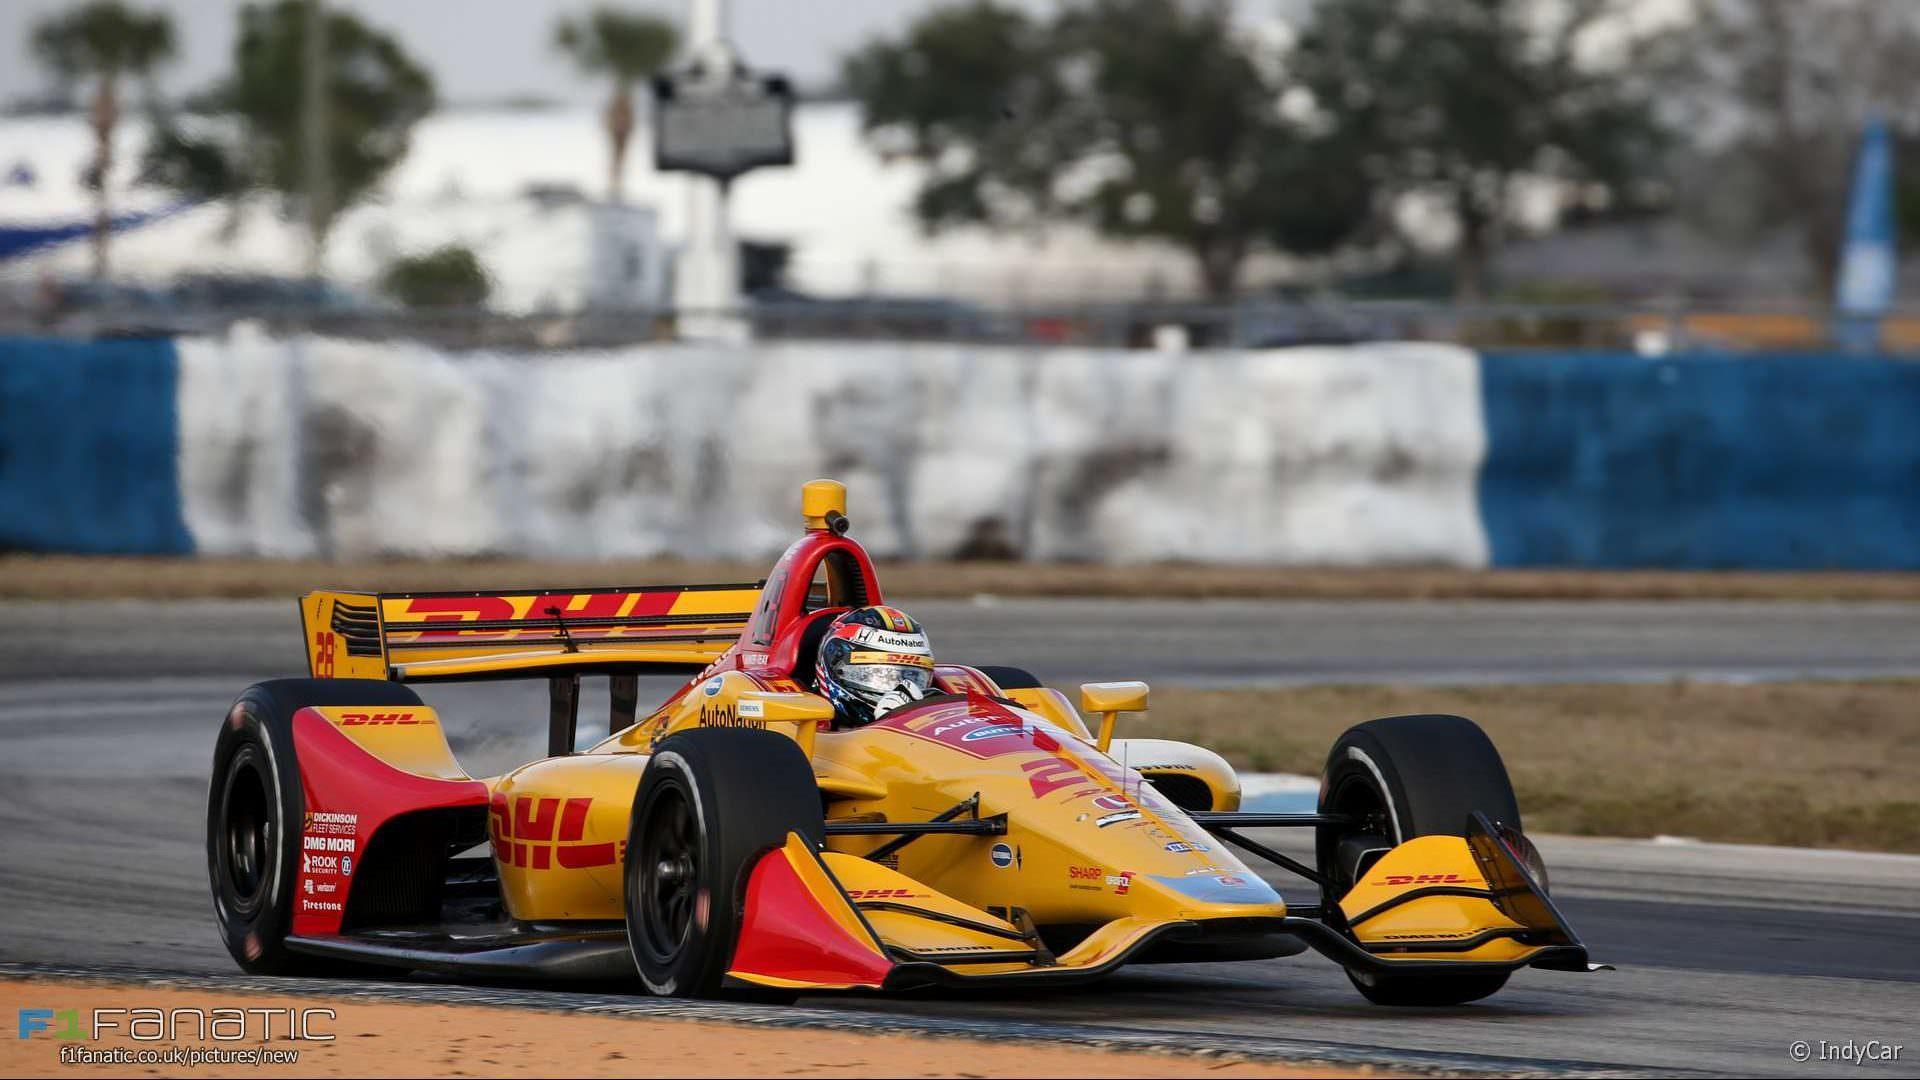 Ryan Hunter-Reay, Andretti, IndyCar, Sebring, 2018 · RaceFans